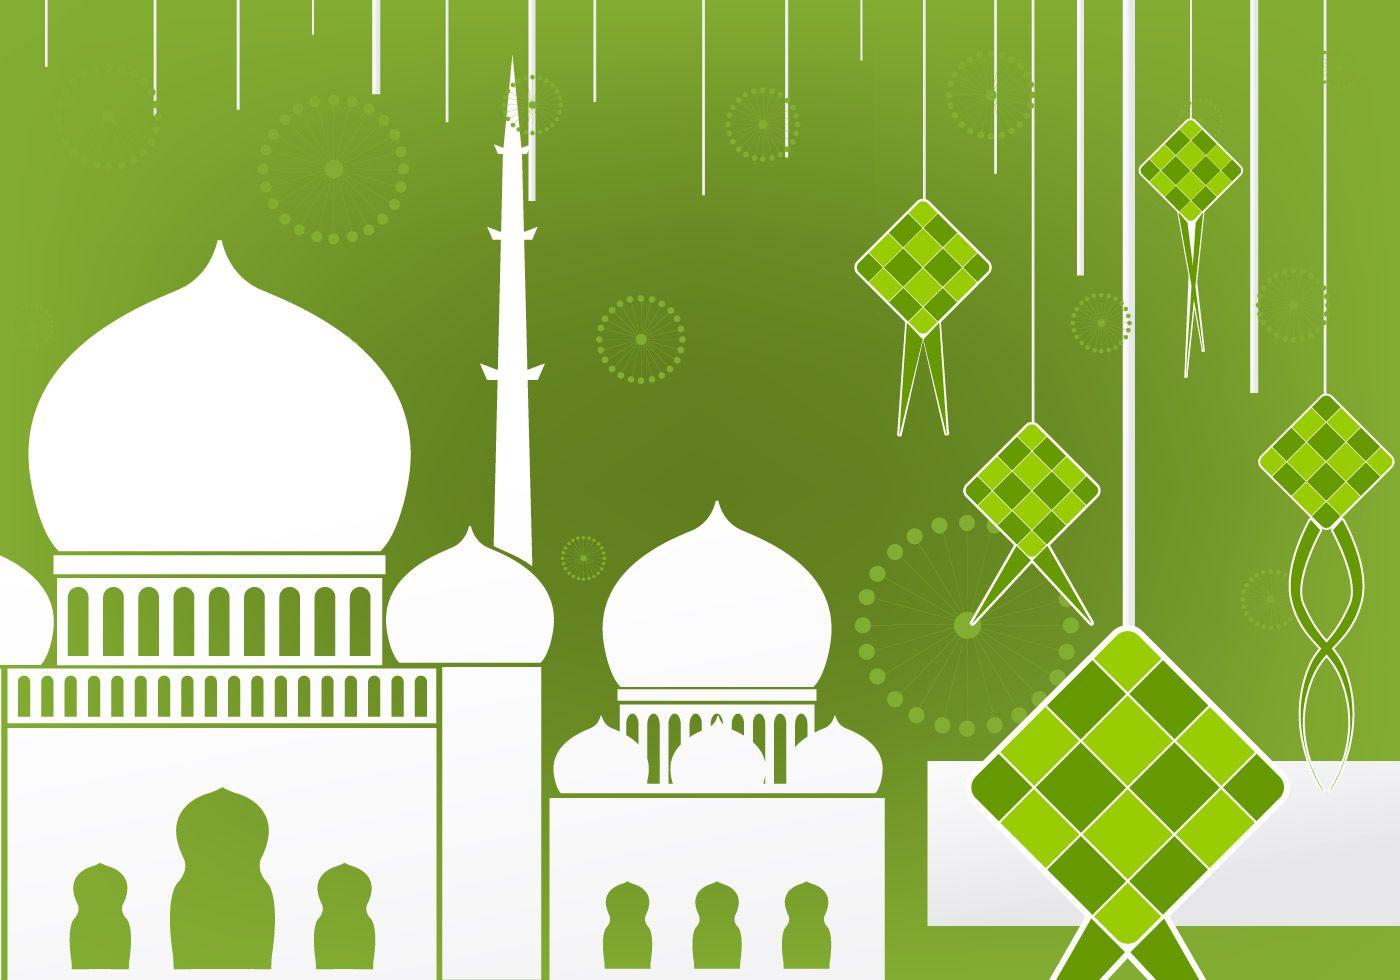 Flat Design Of Ketupat And Mosque Eid Card Designs Wallpaper Wa Vector Illustration Design